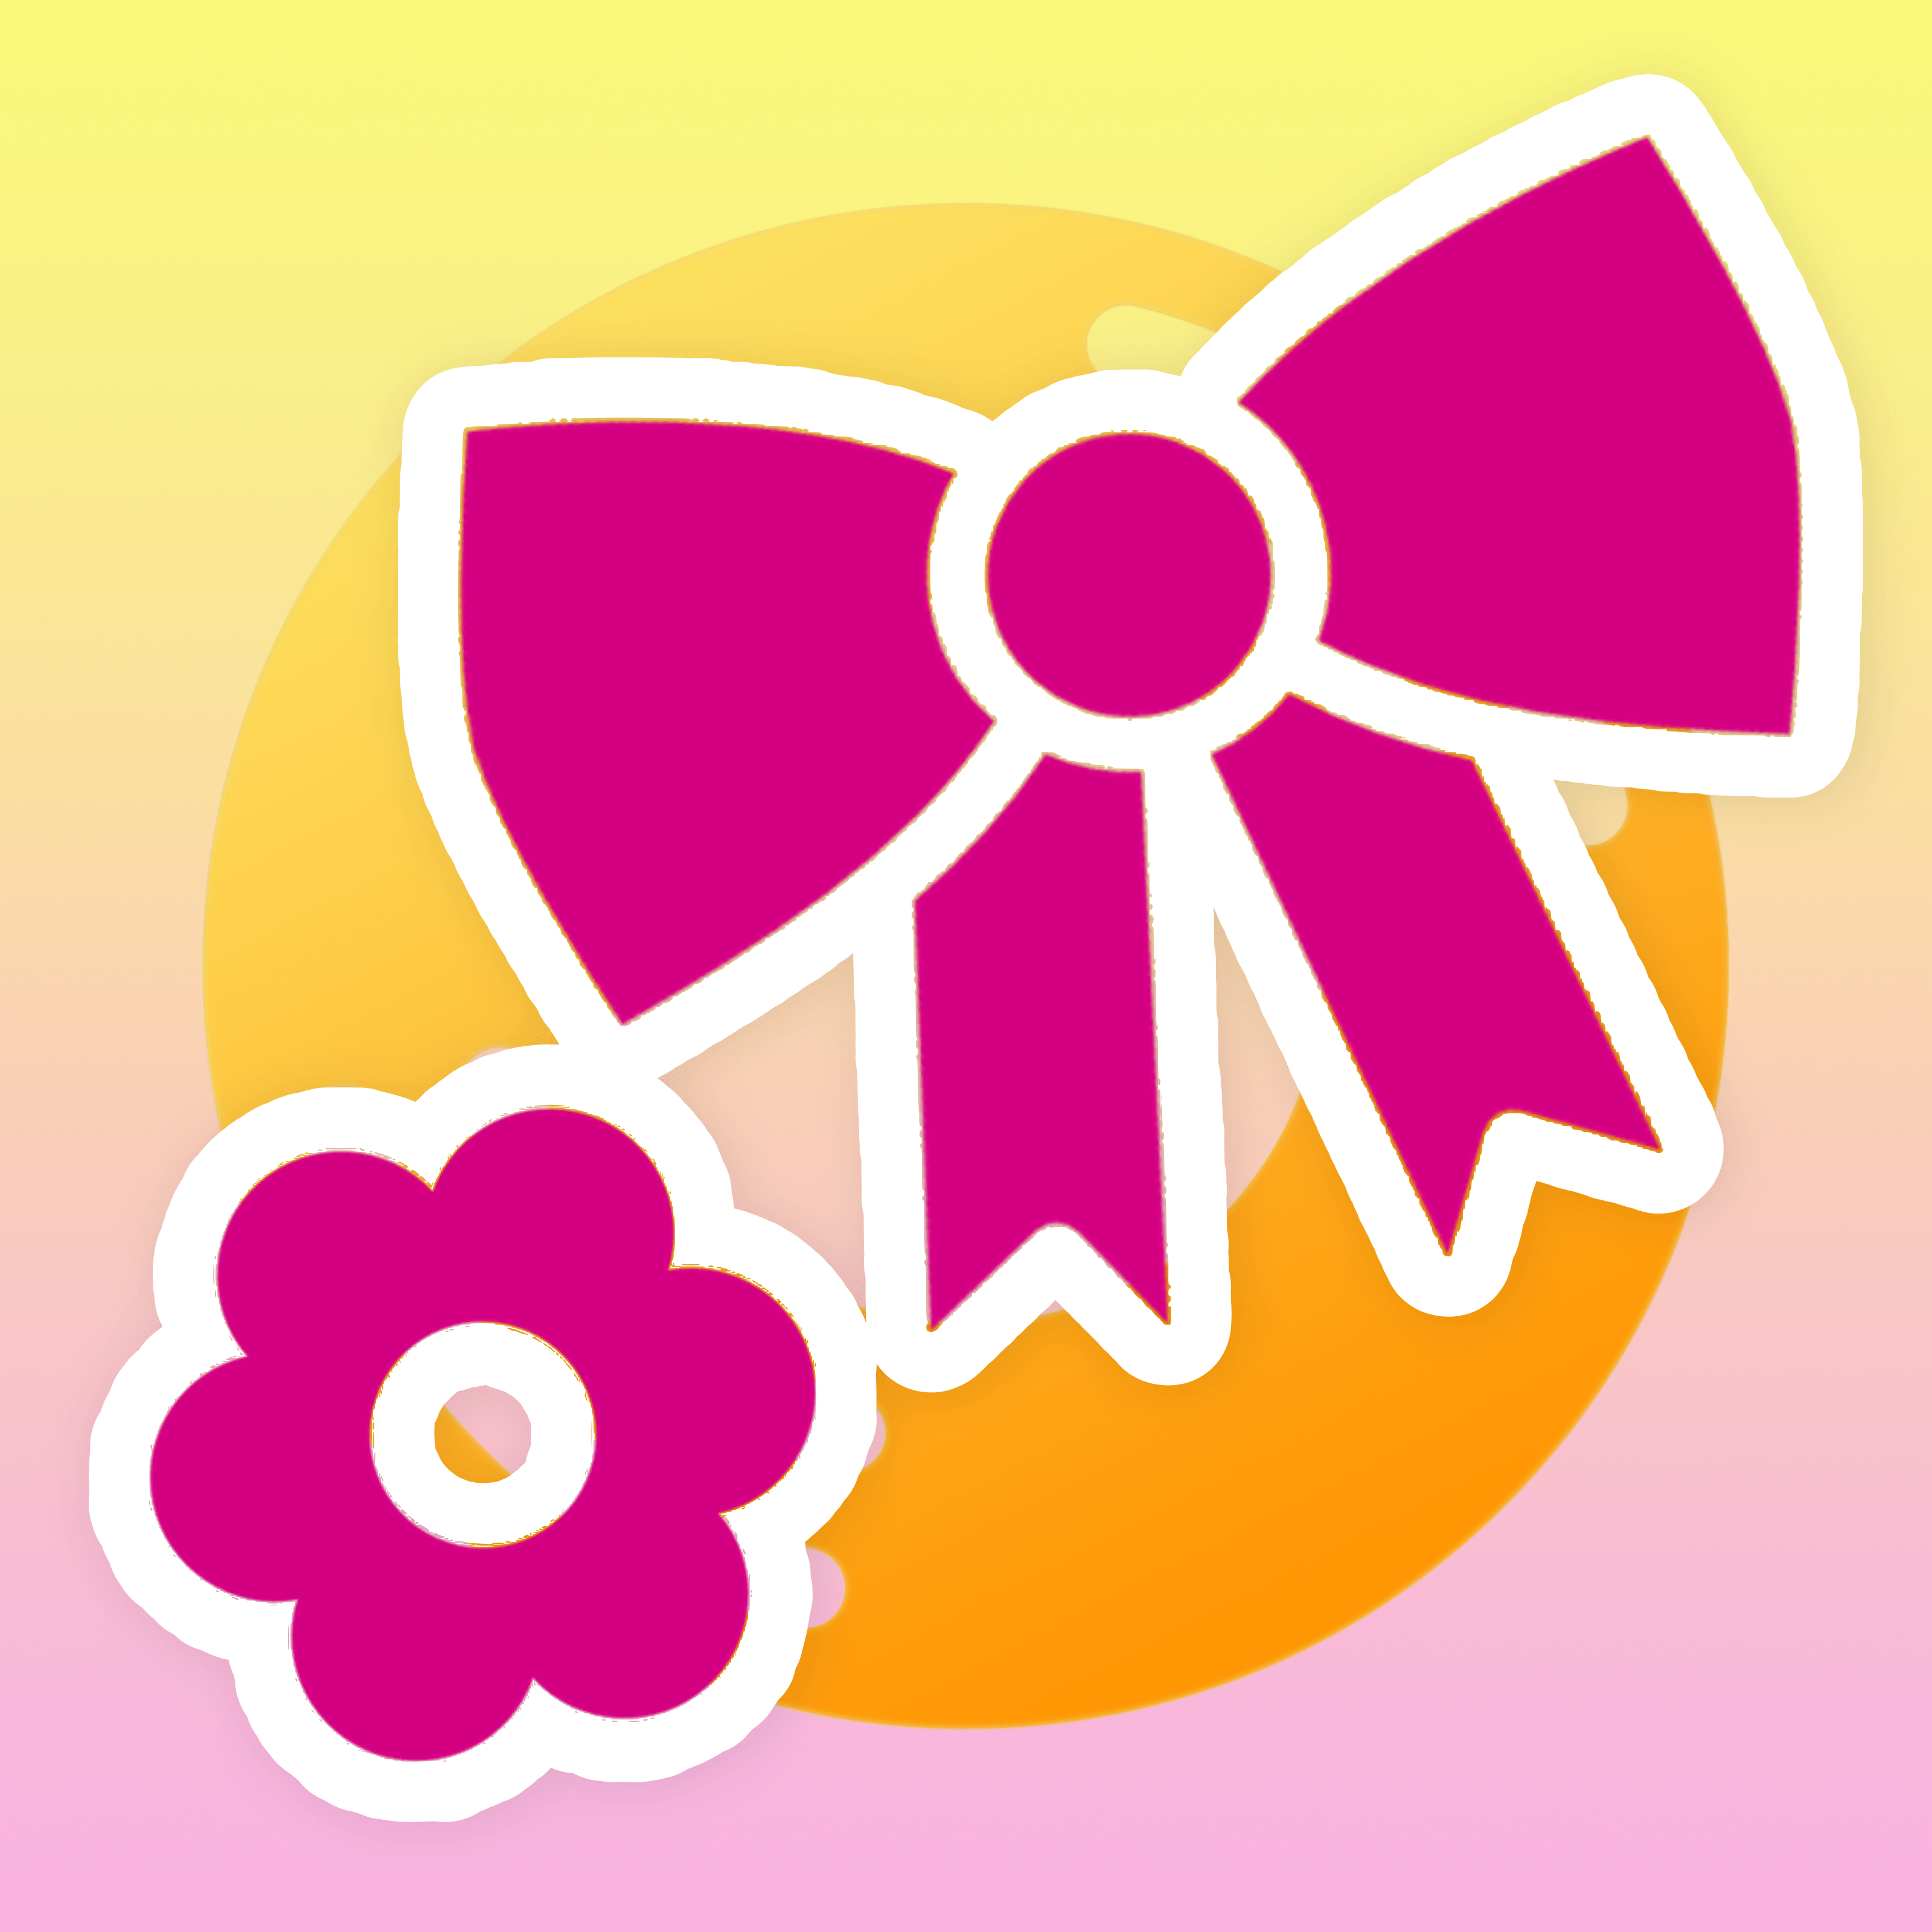 Setsuna-yukiFOREVER avatar